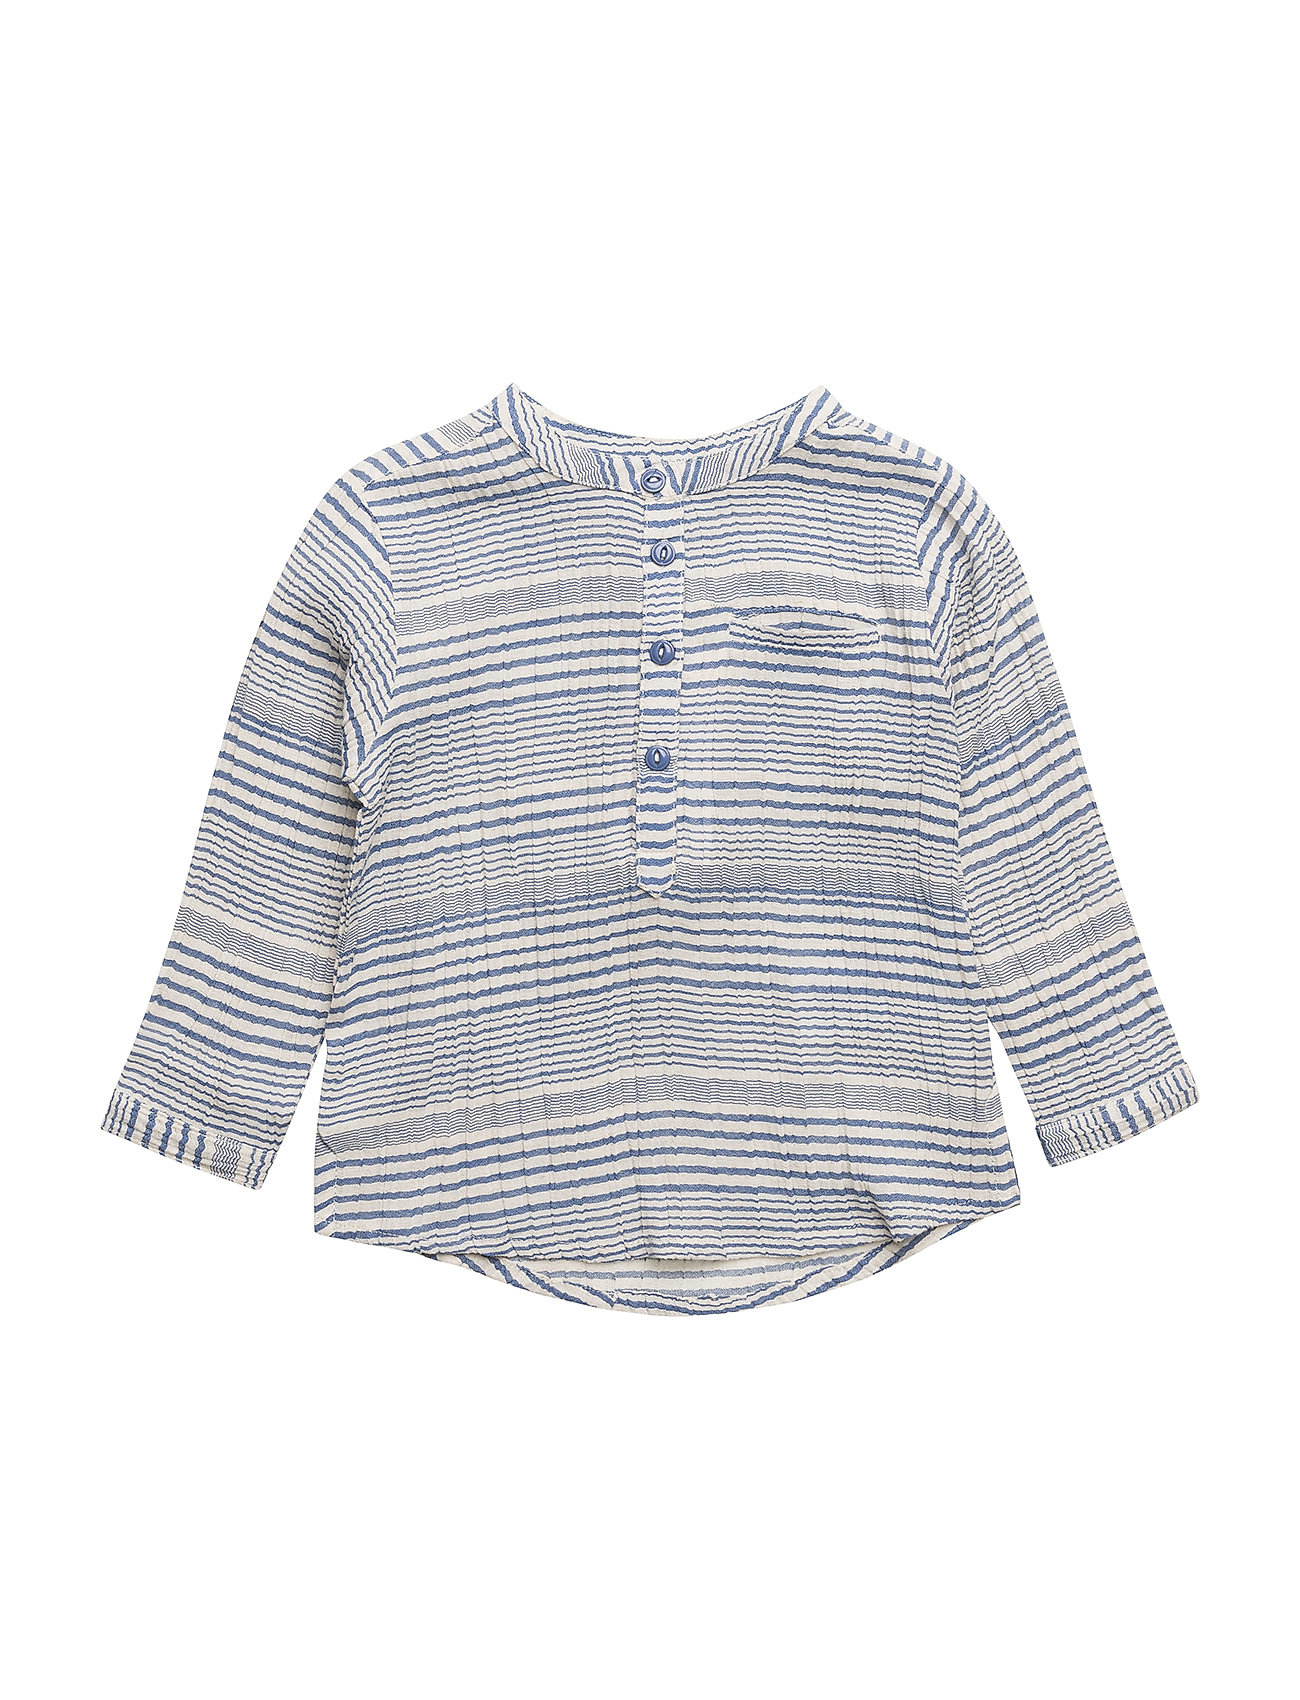 Mini A Ture Lai Shirt, M - TRUE NAVY